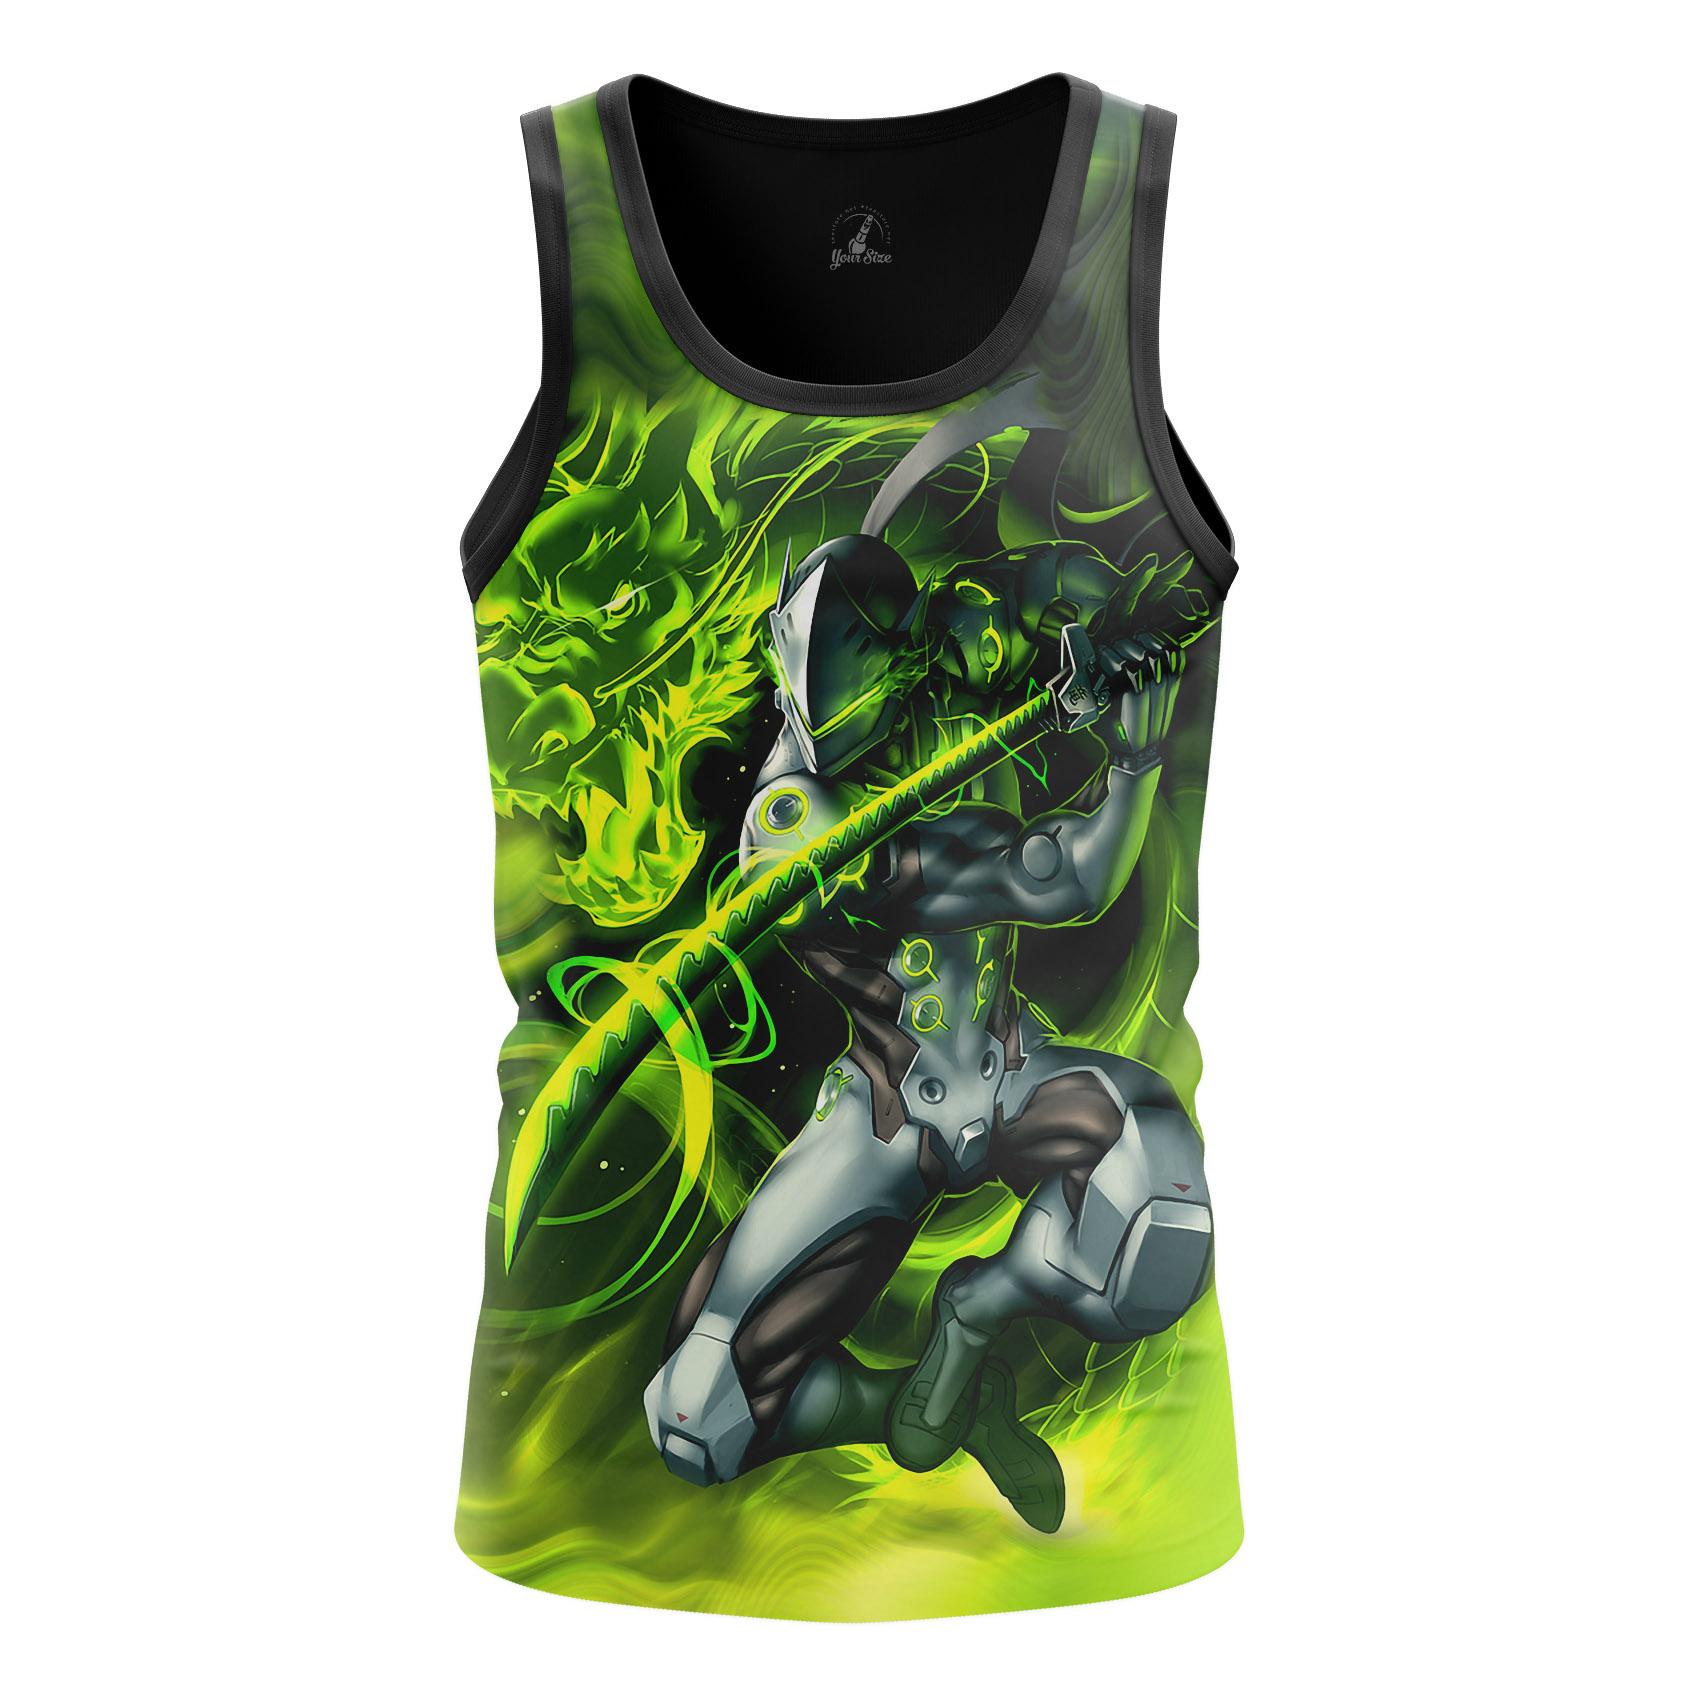 Collectibles Men'S T-Shirt Genji Overwatch Gaming